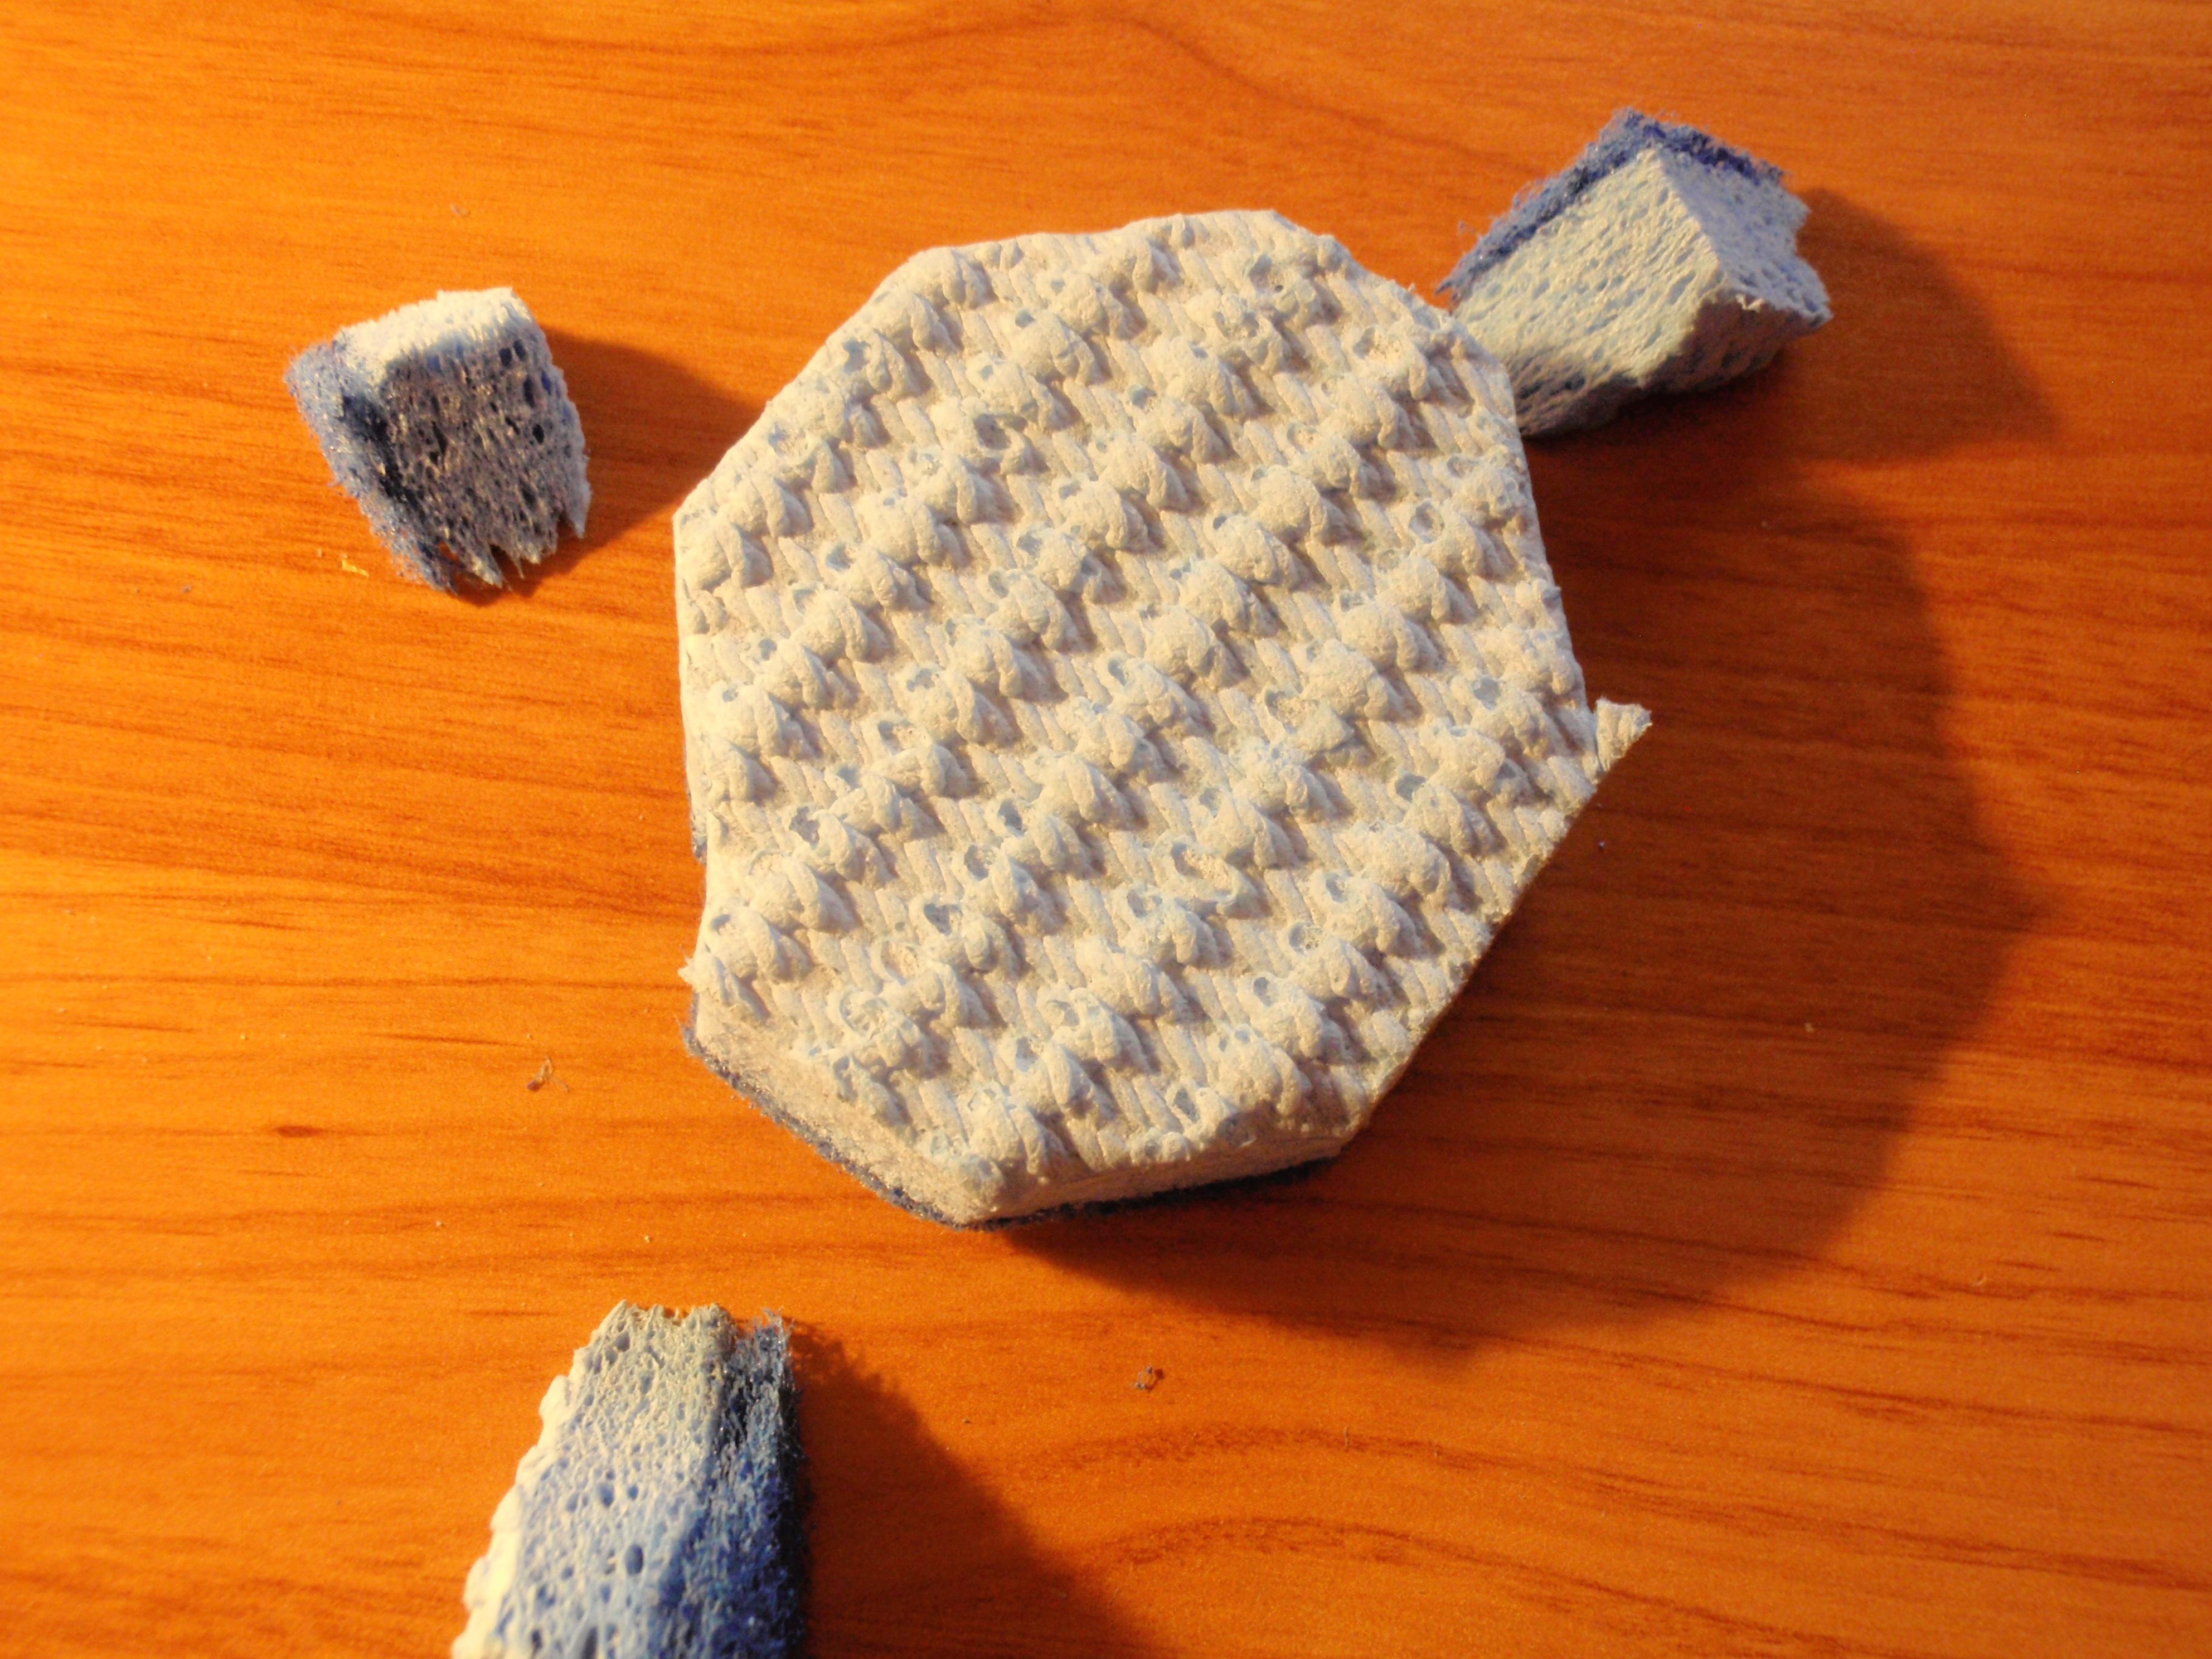 Picture of Trim the Sponge